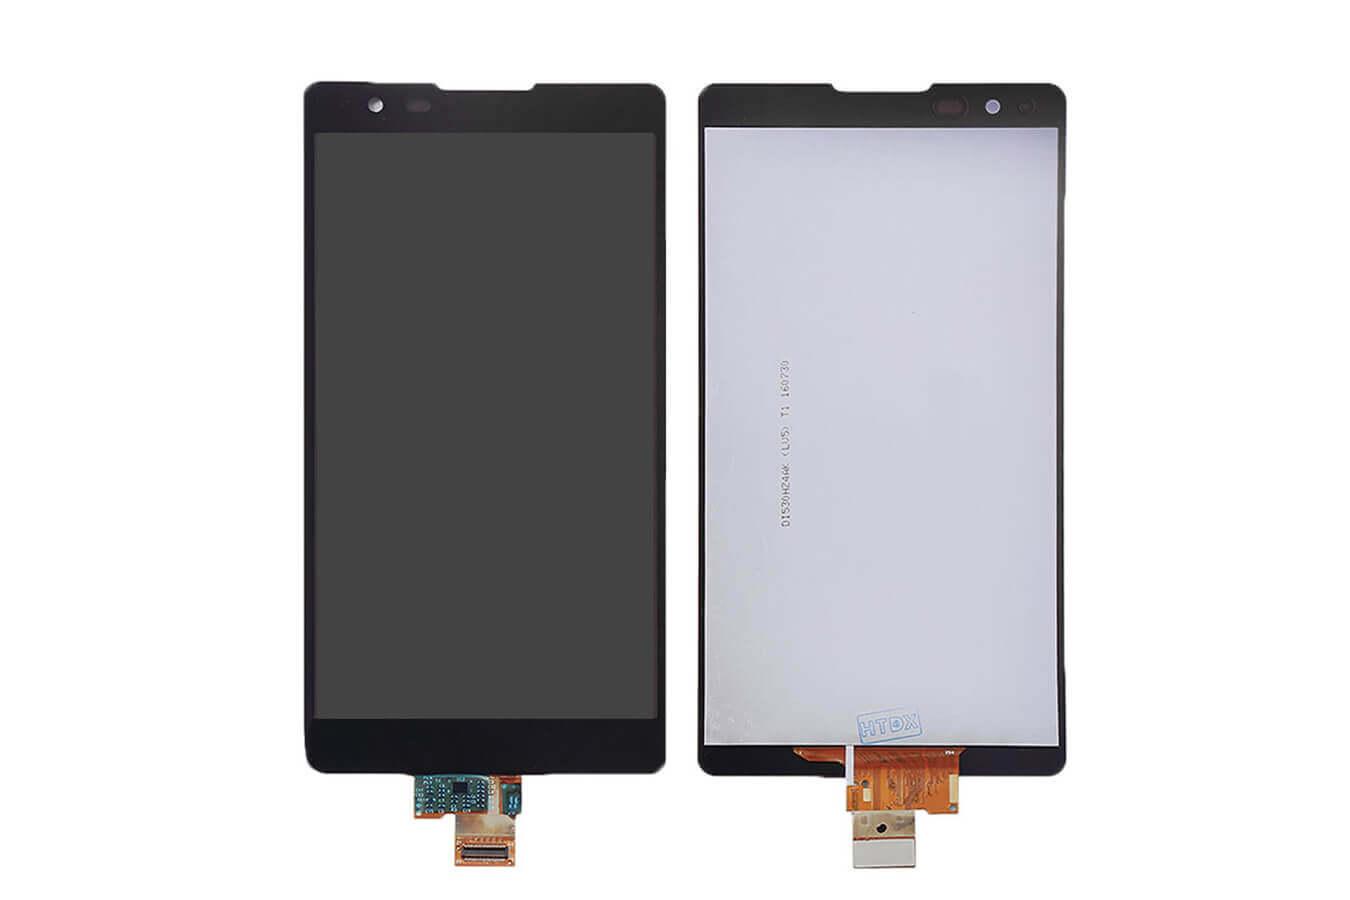 Картинка Дисплей LG K220/X Power в сборе с тачскрином от магазина NBS Parts